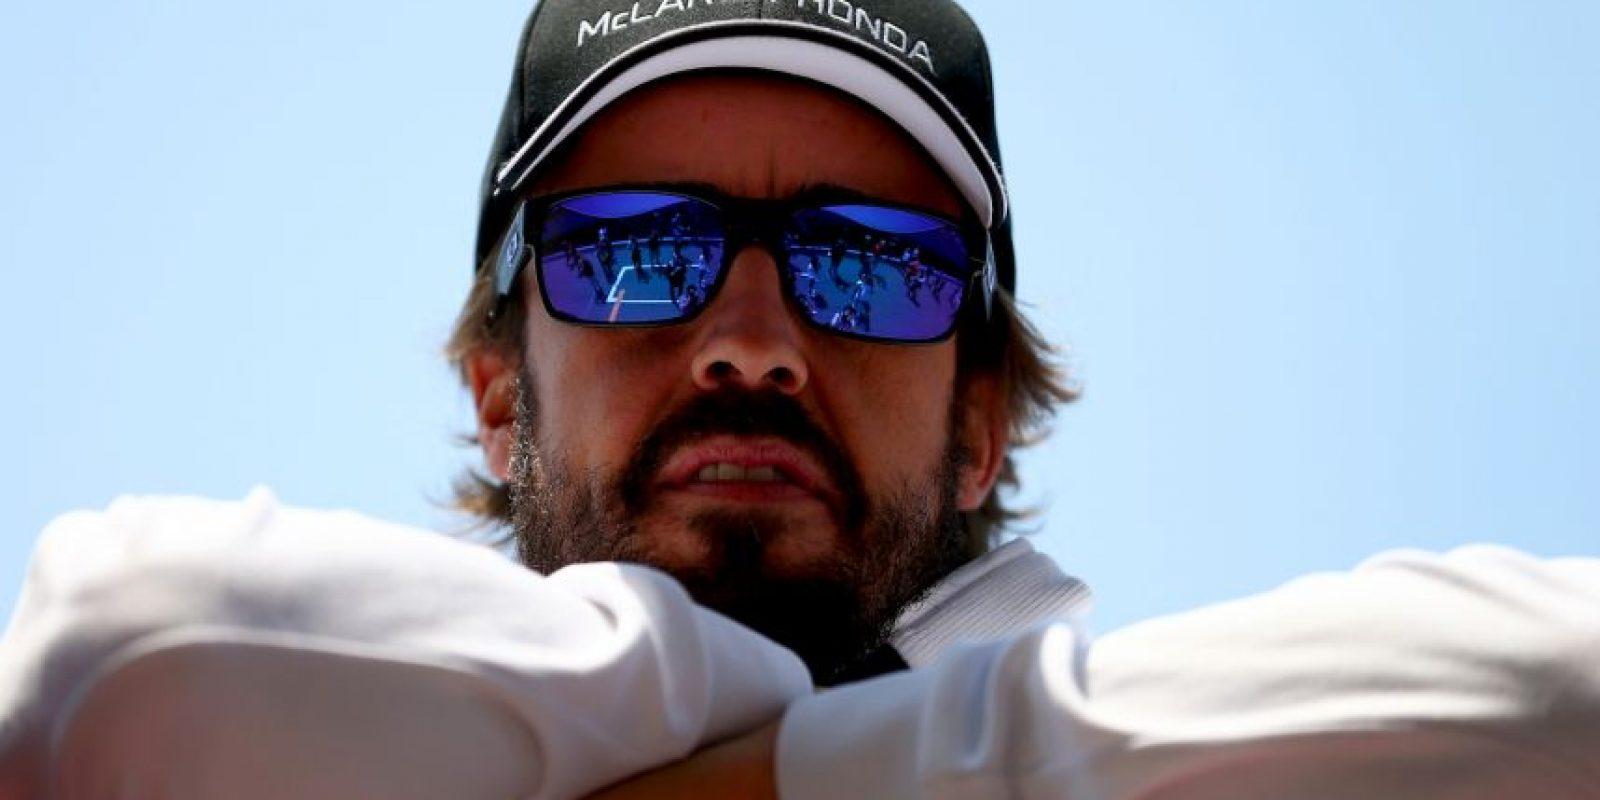 21. Fernando Alonso @alo_oficial (Fórmula 1/España): 13 mil 064 dólares por tuit. Foto:Getty Images